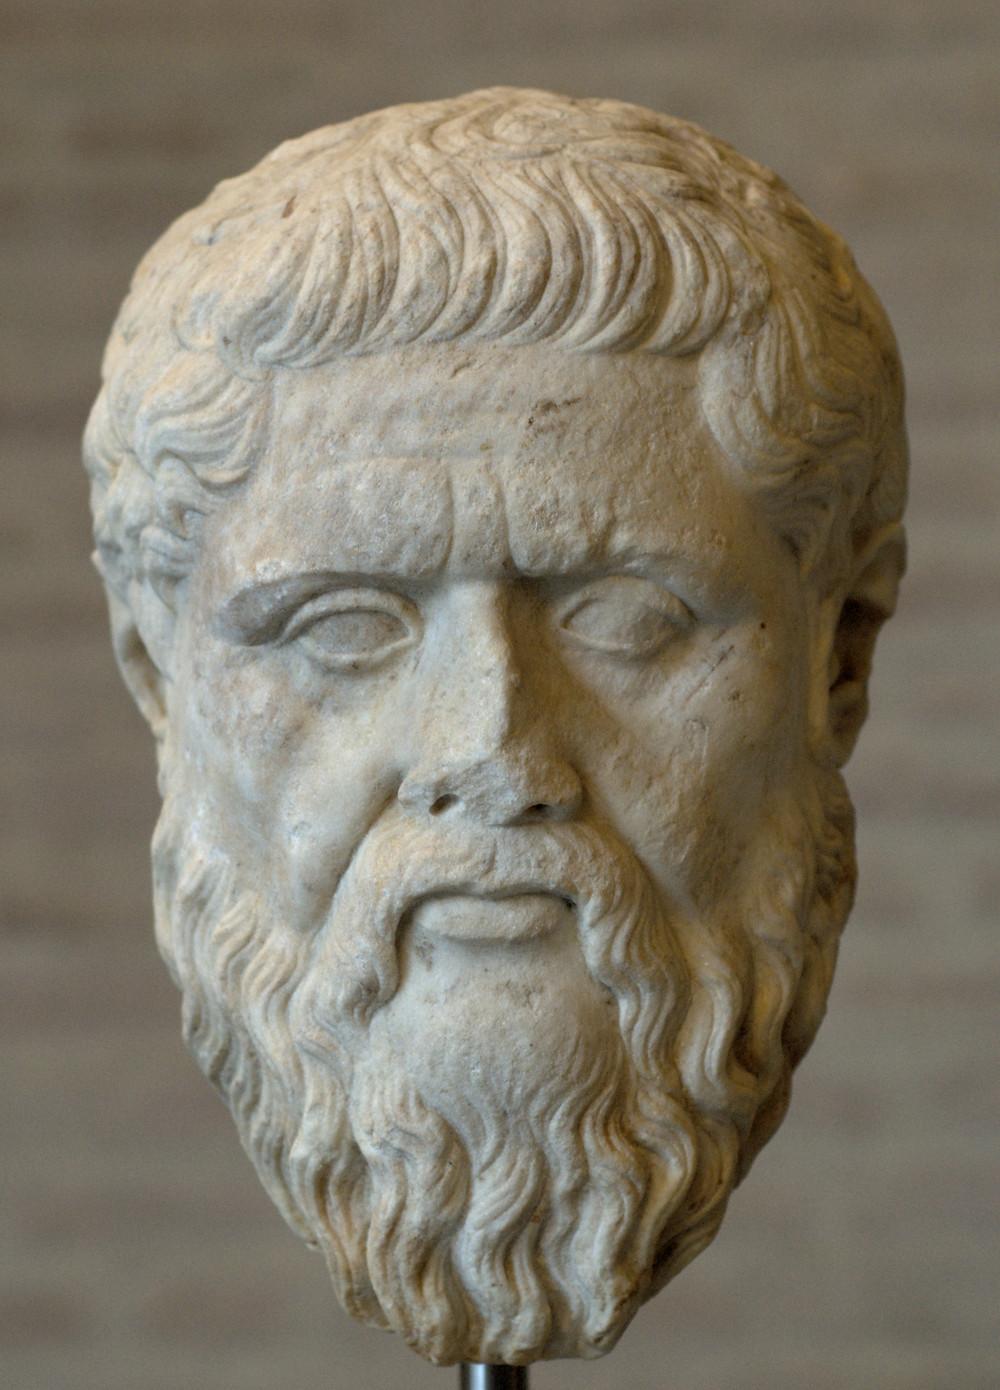 Platon (Image in public domain)